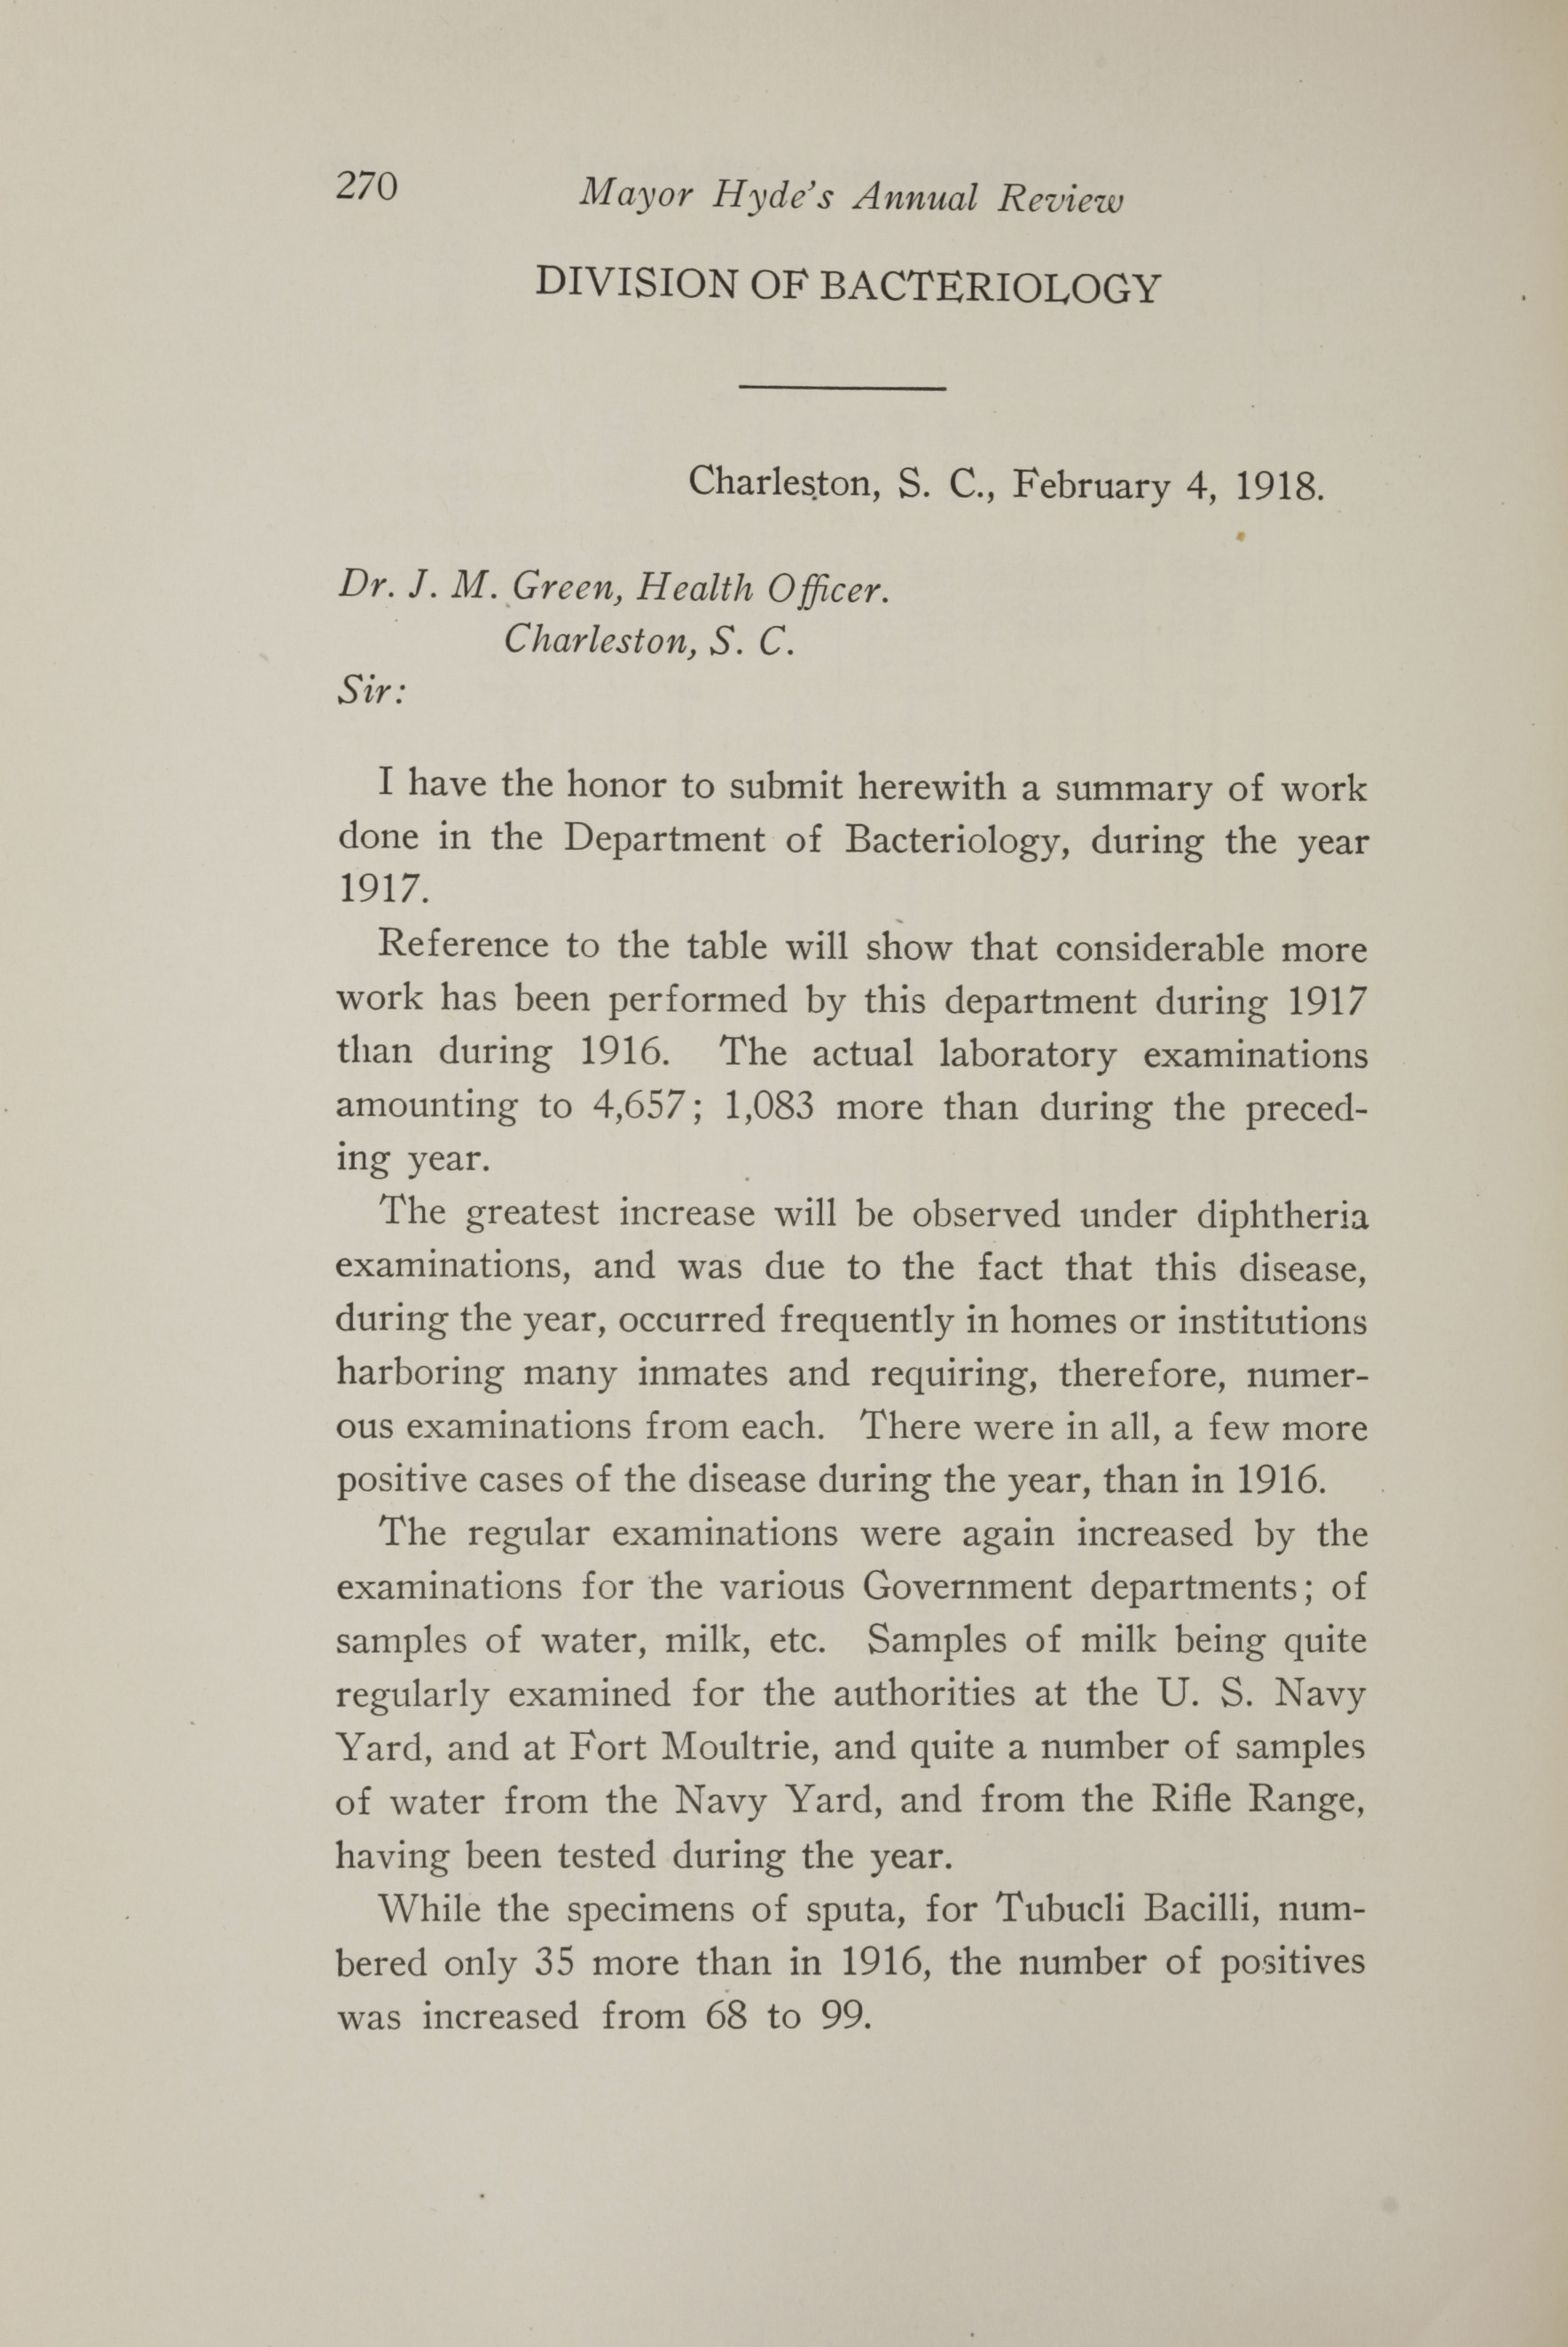 Charleston Yearbook, 1917, page 270